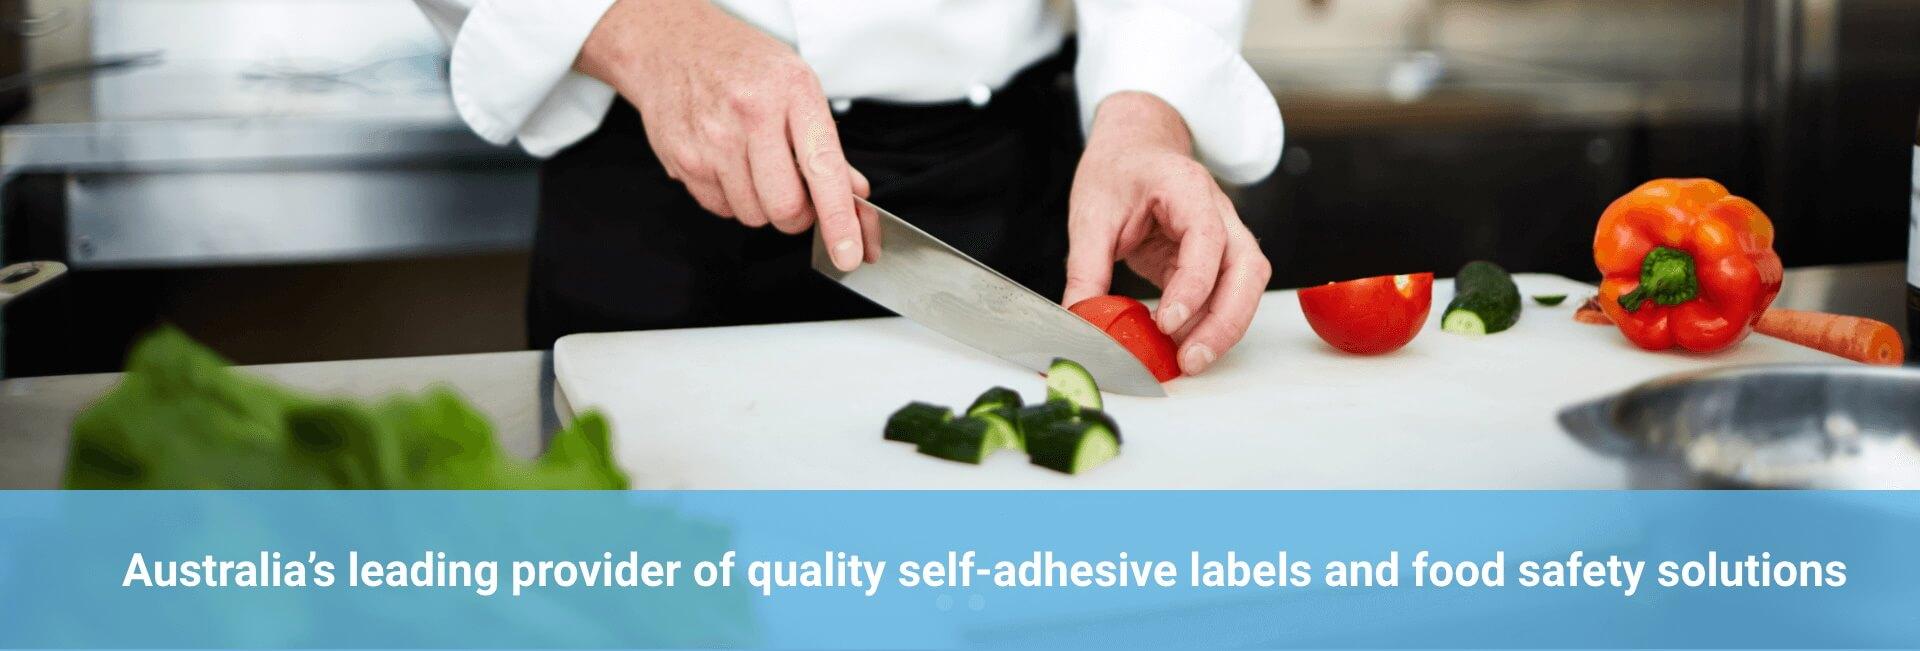 Food label stickers in Australia